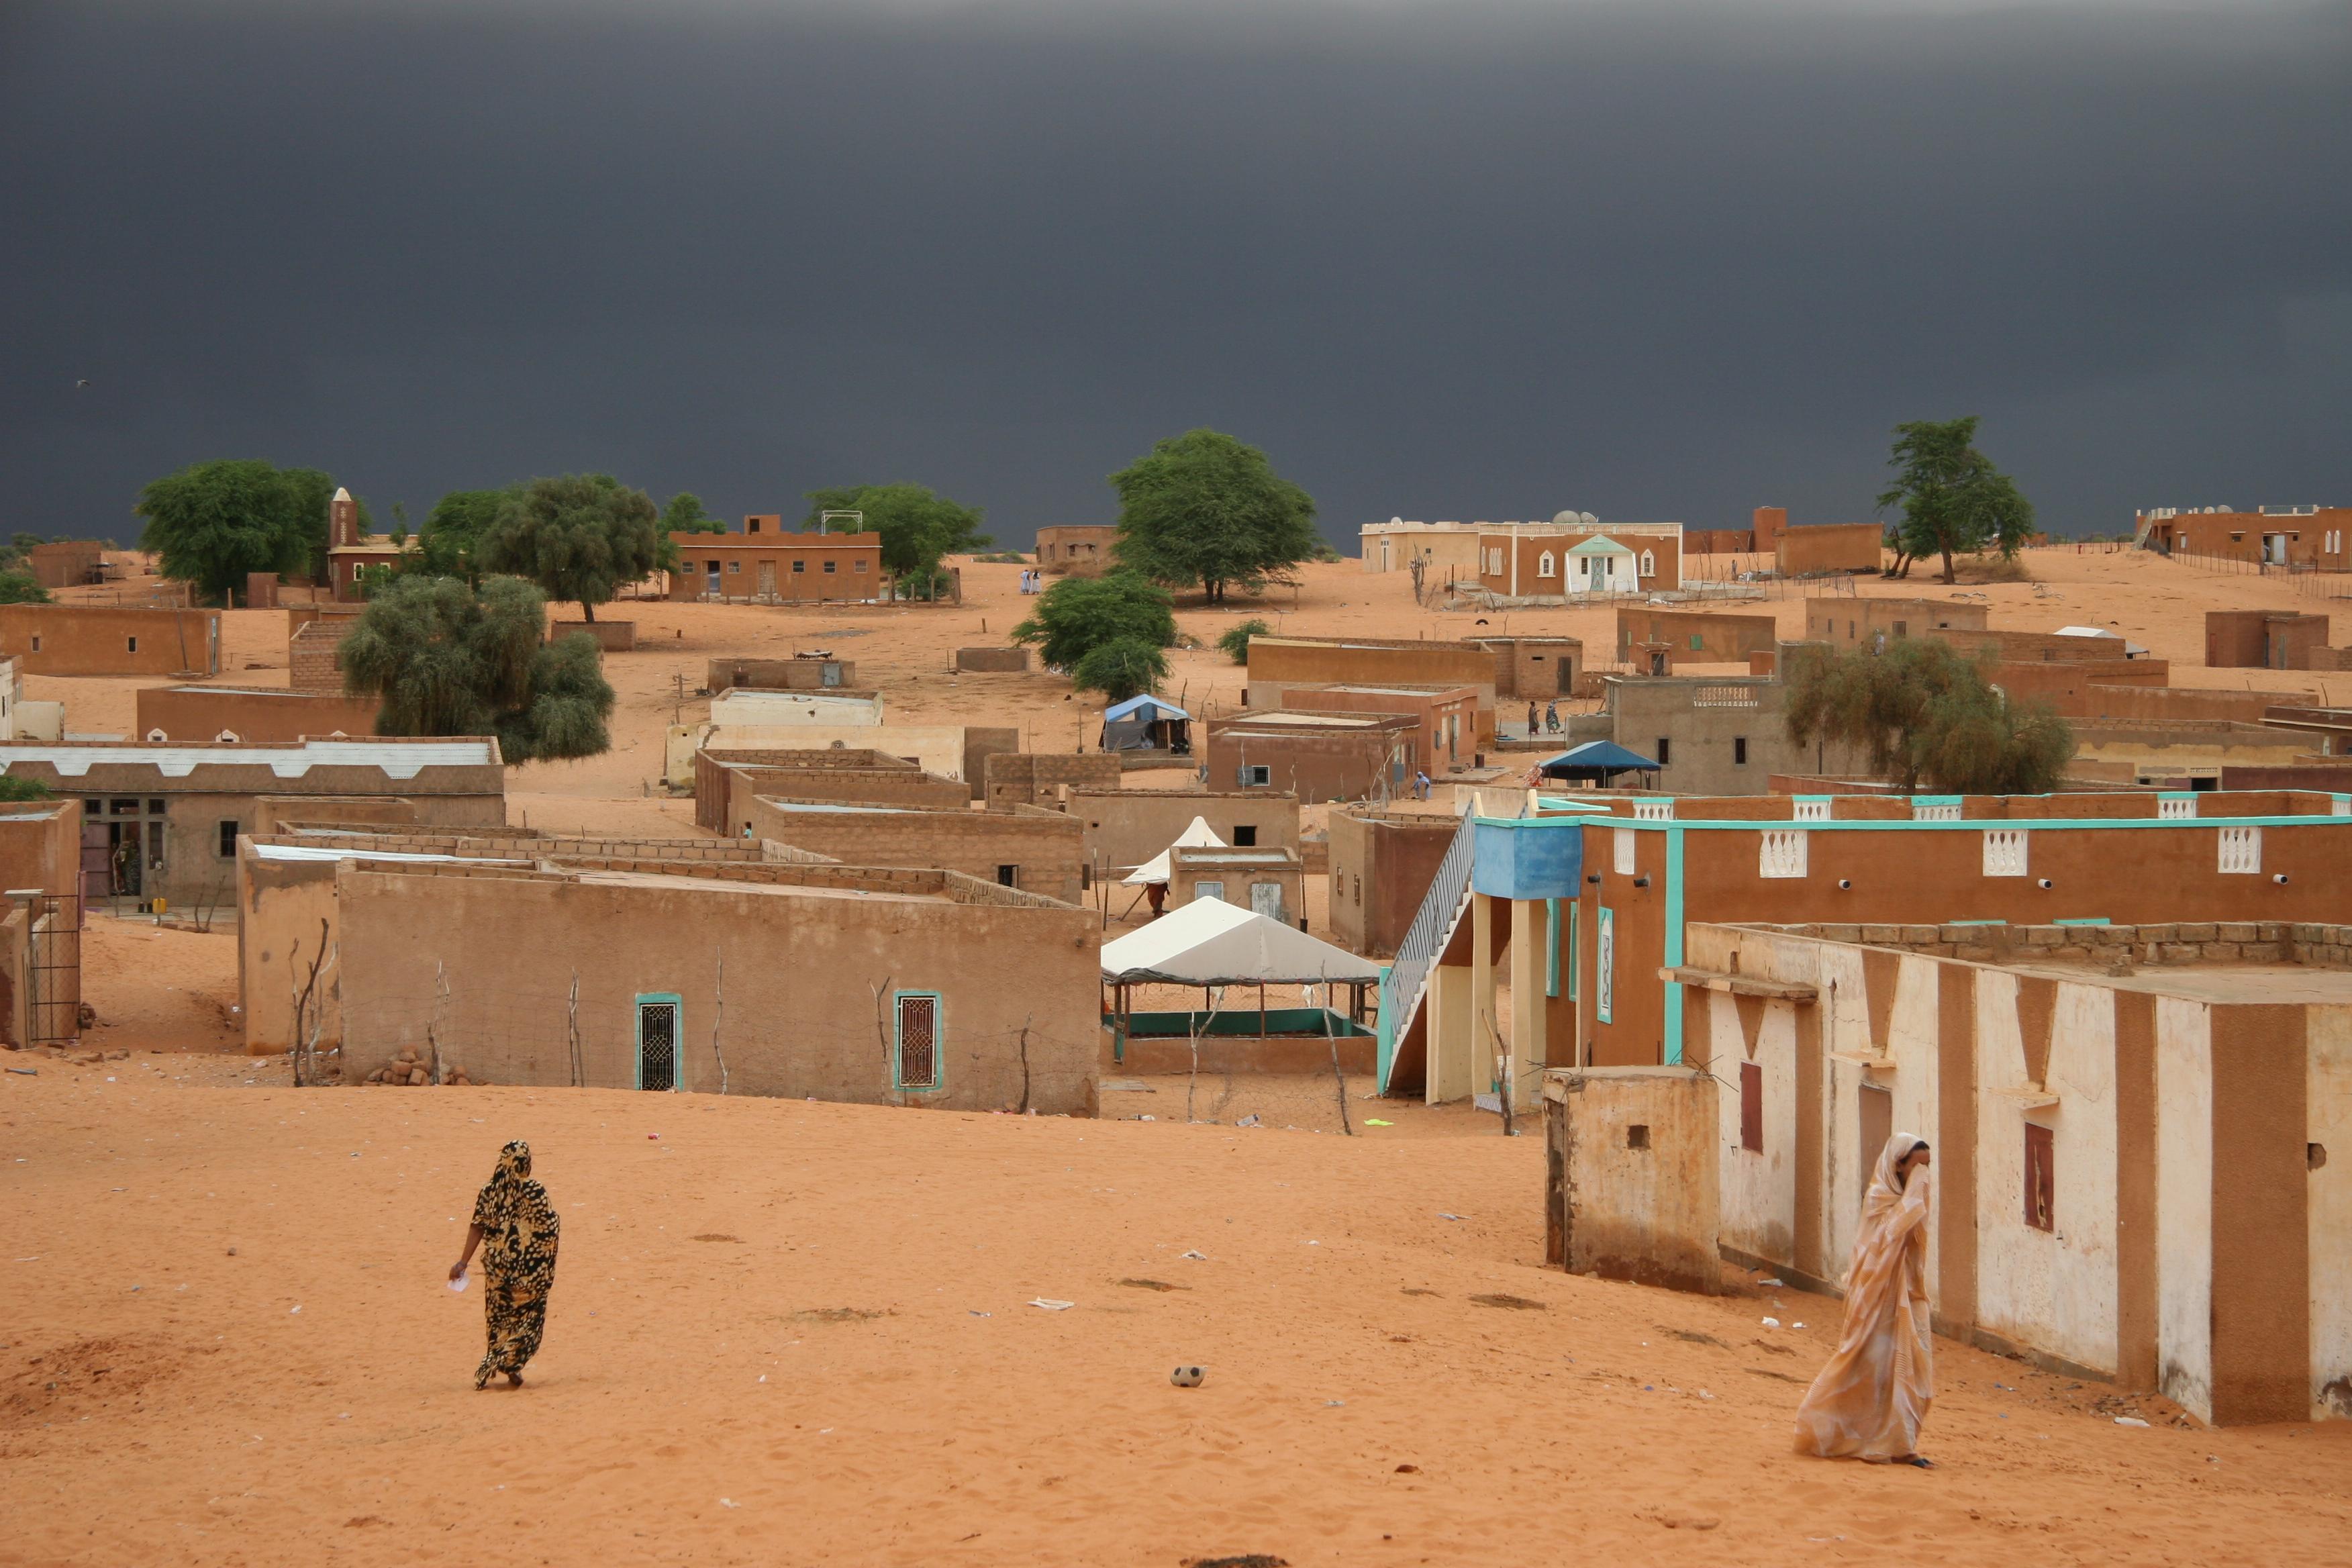 http://upload.wikimedia.org/wikipedia/commons/3/37/Bareina%2C_Mauritania.jpg